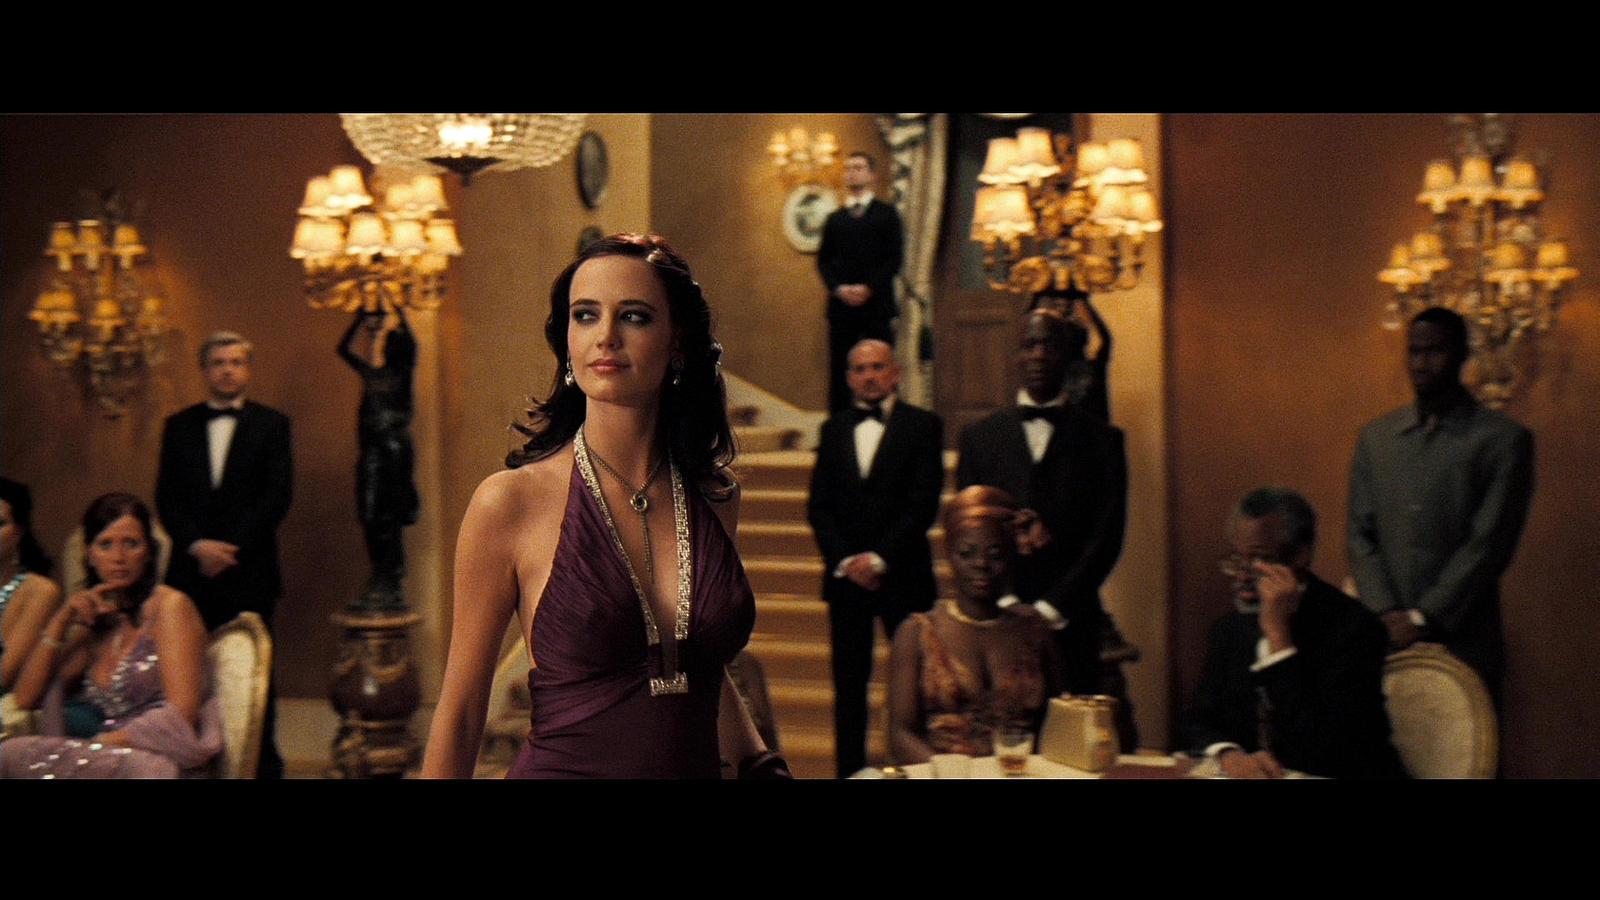 vesper 007 casino royale